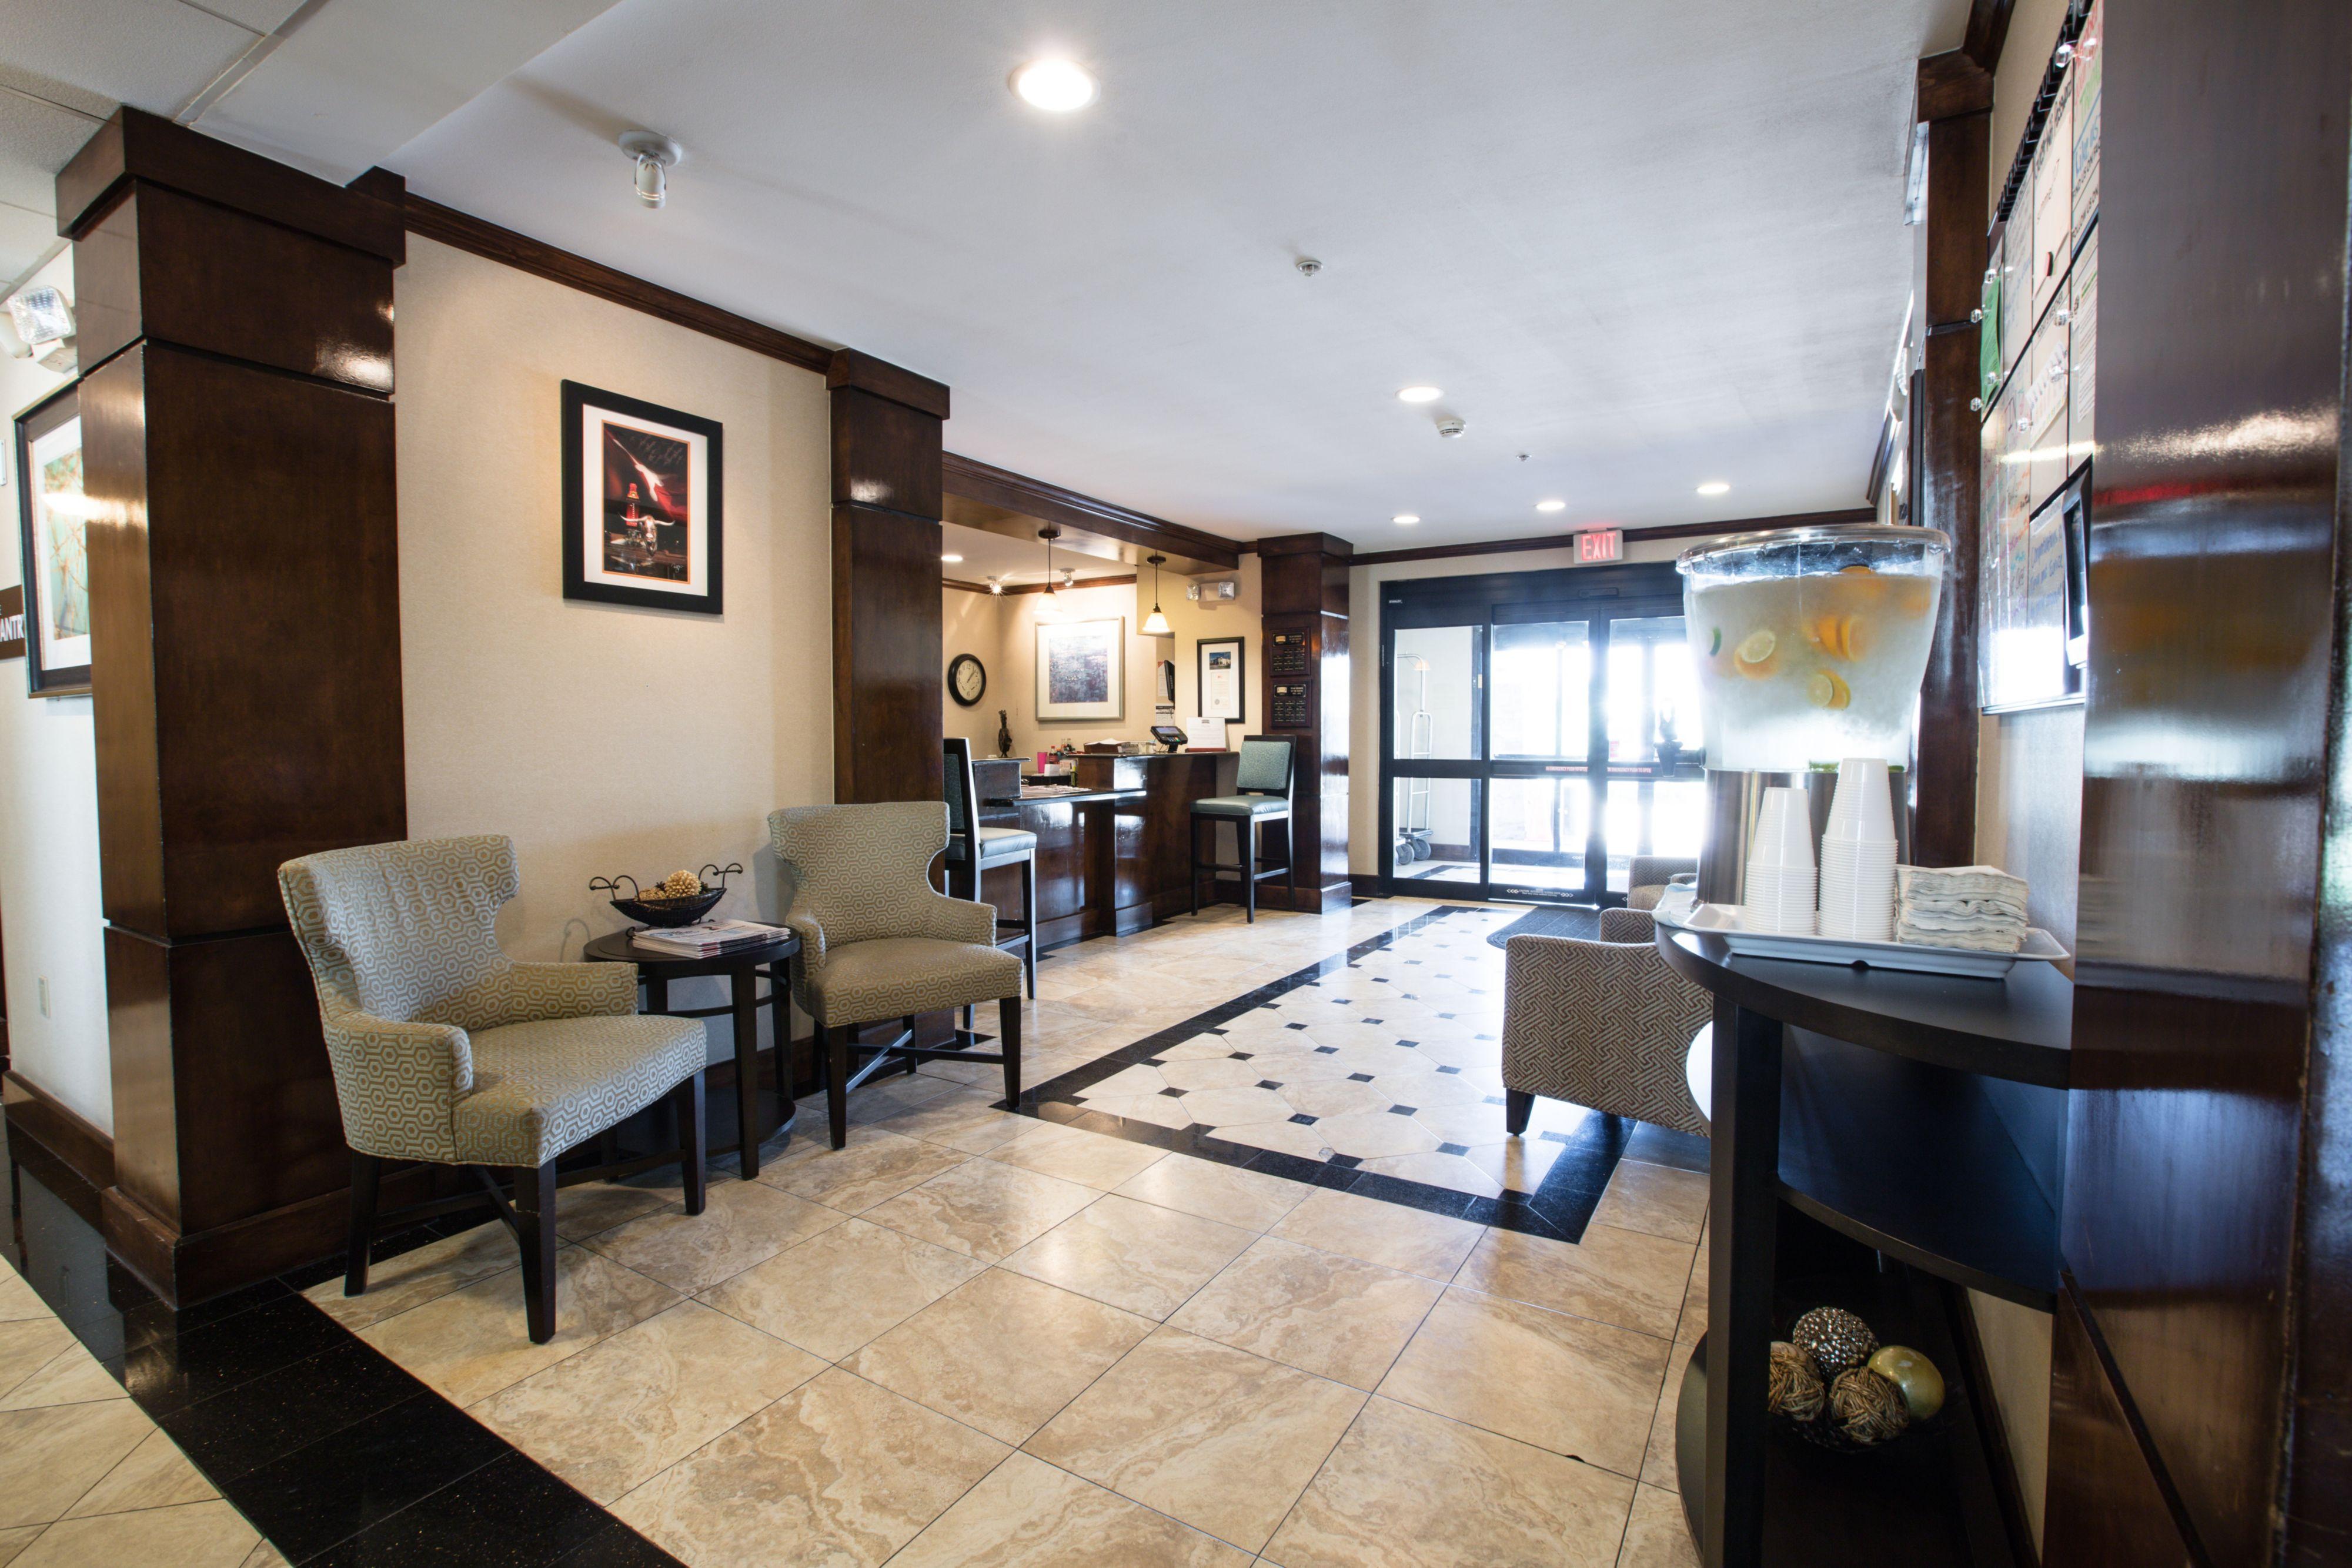 staybridge suites austin airport at 1611 airport commerce. Black Bedroom Furniture Sets. Home Design Ideas